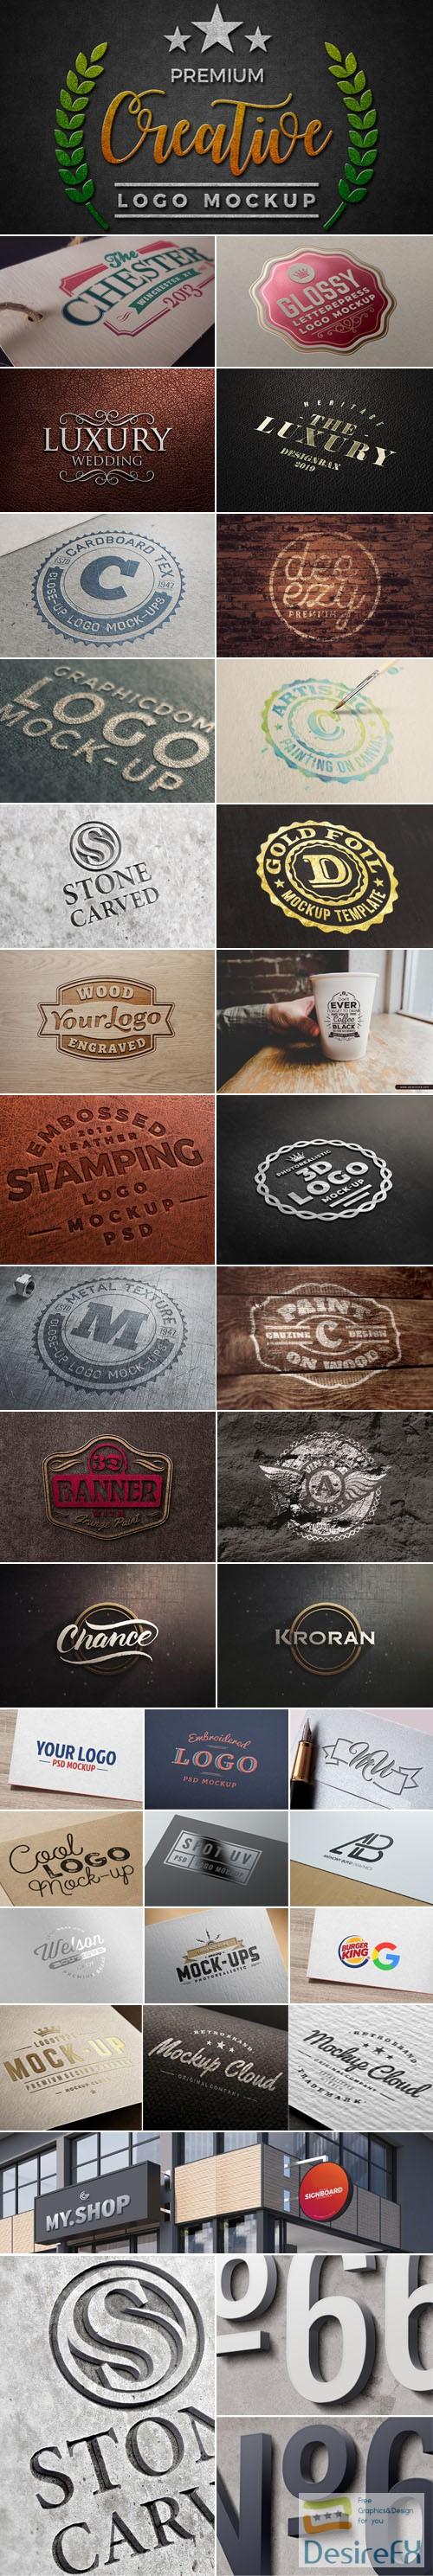 mock-up - 33 High Quality Logo PSD Mockups Collection